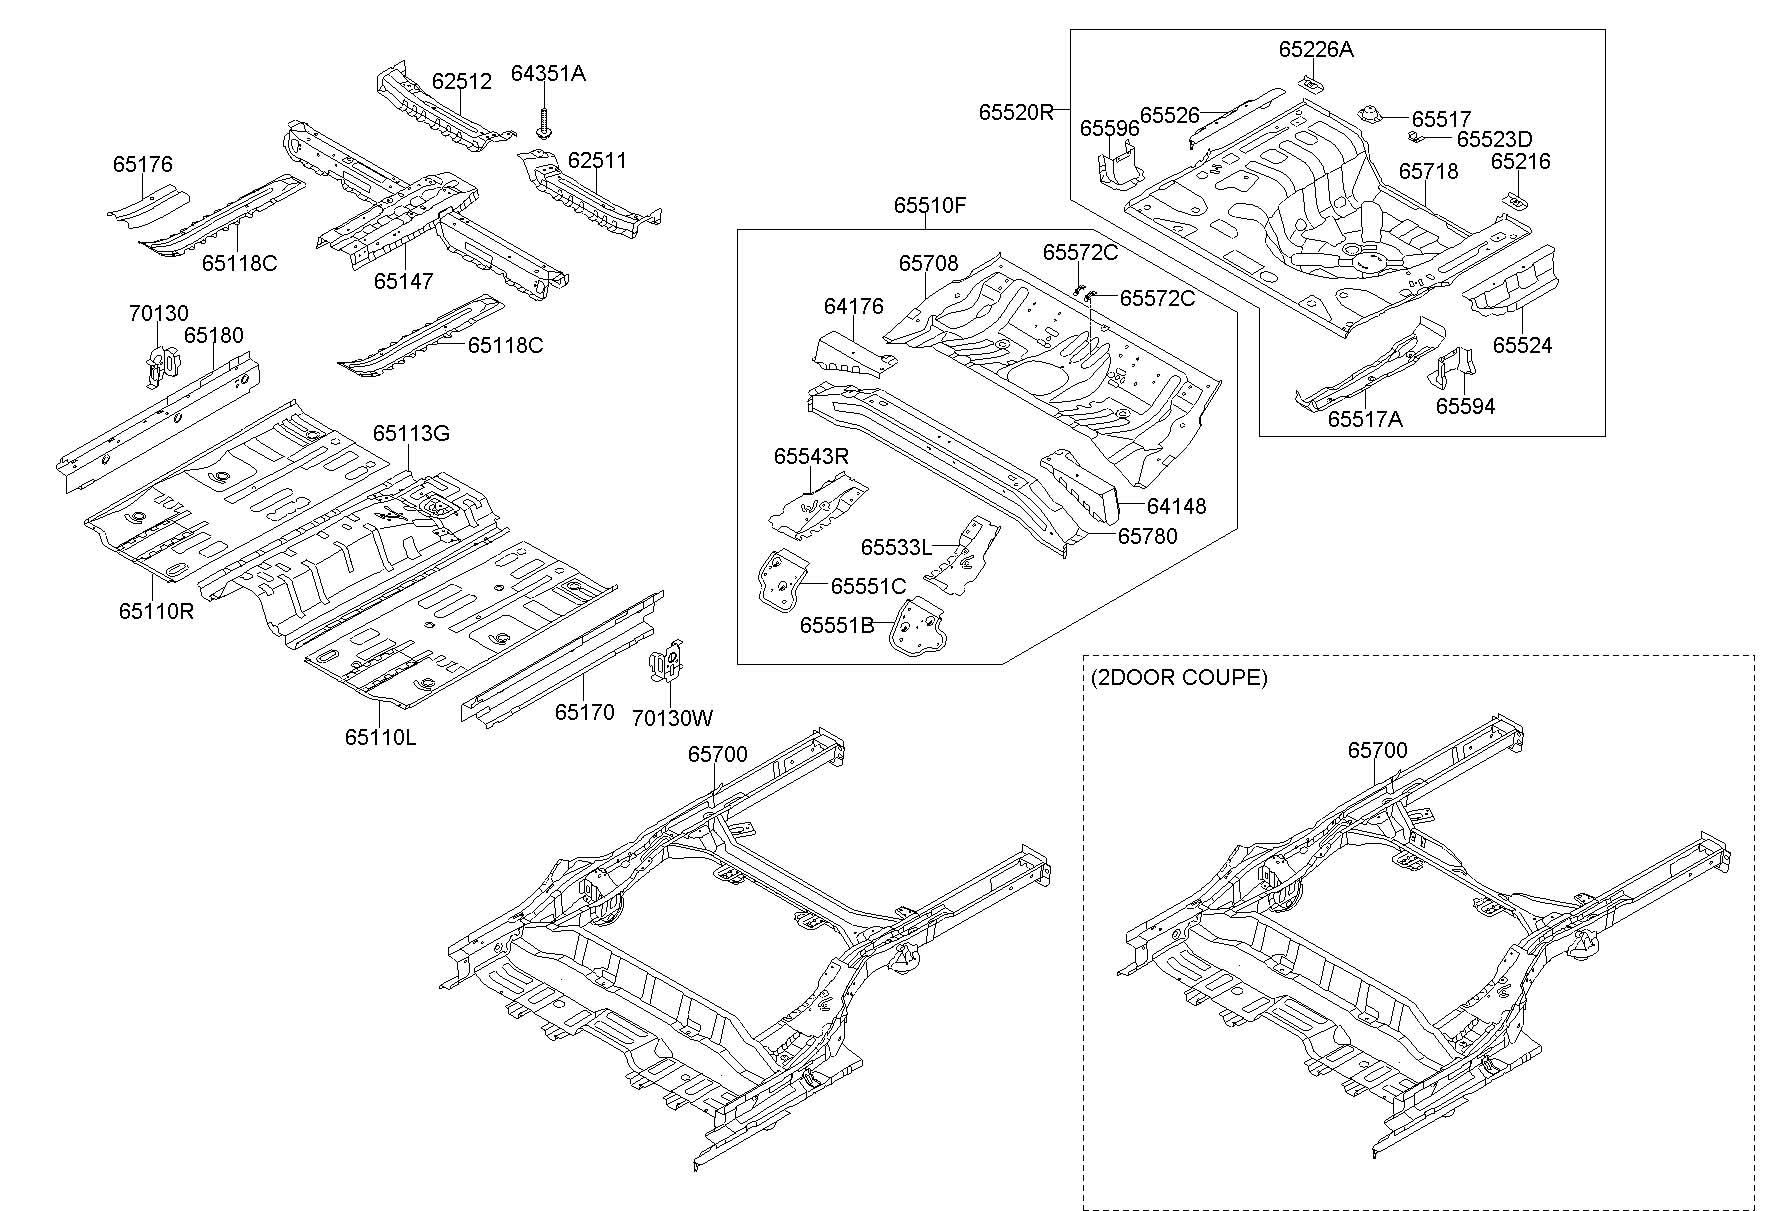 tags: #hyundai sonata suspension diagram#discount hyundai parts#2001 hyundai  accent parts diagram#2009 hyundai tucson parts diagram#2008 hyundai santa  fe